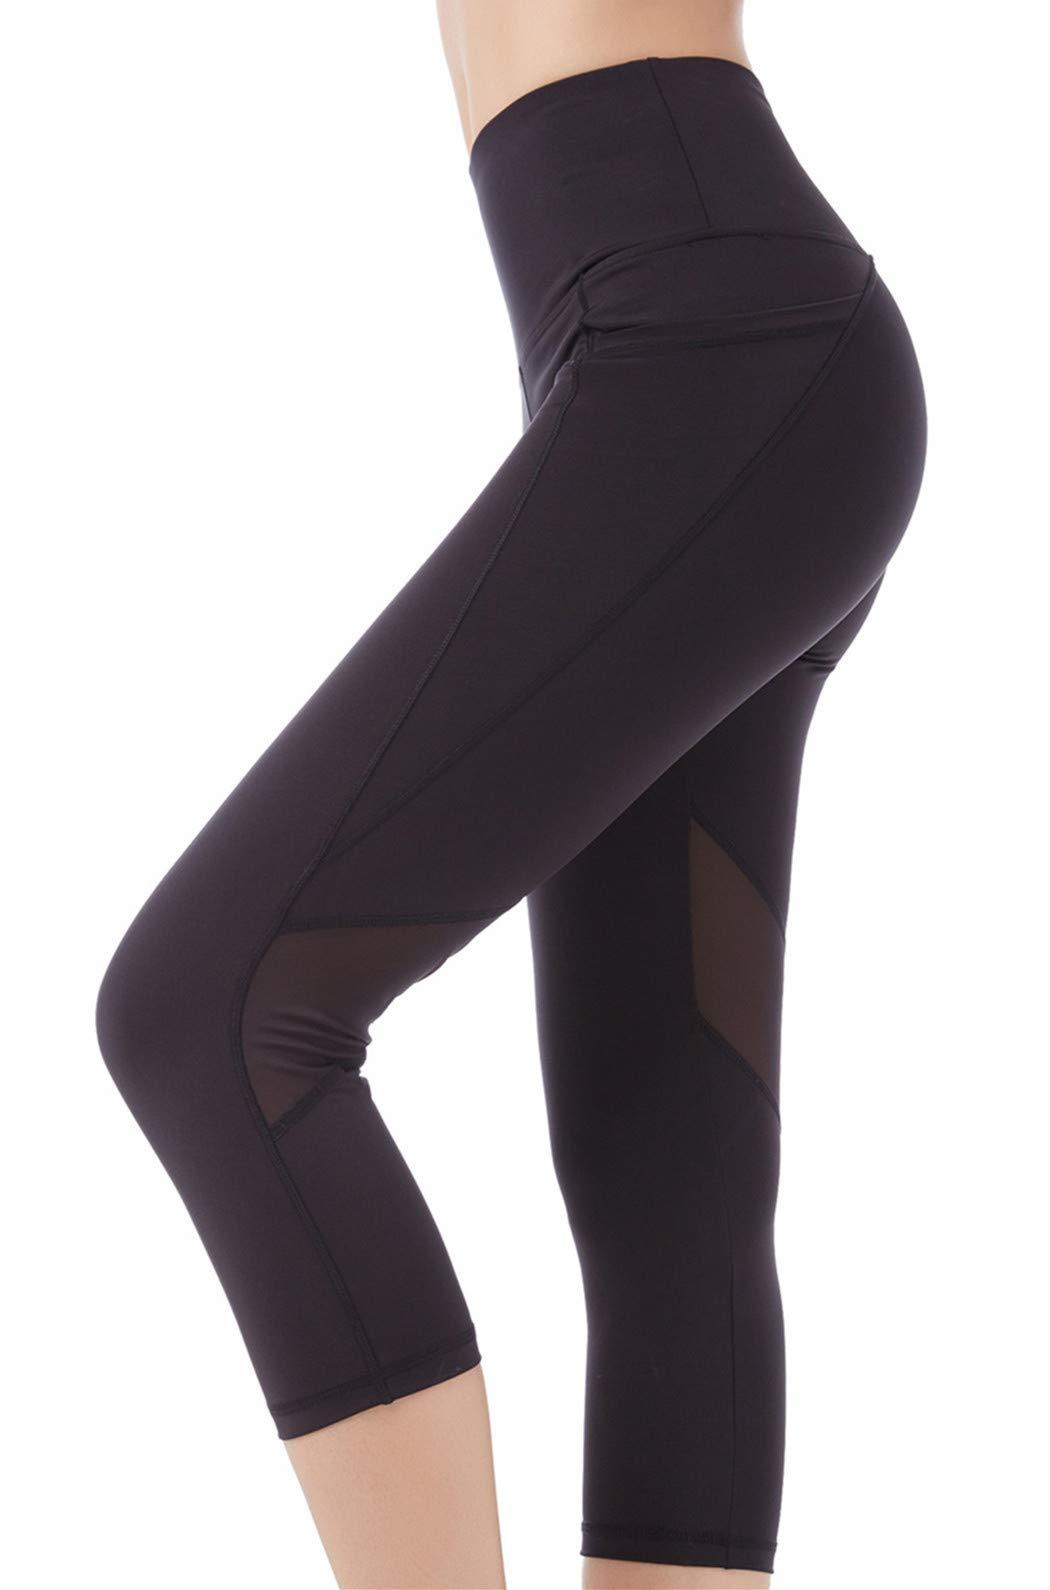 Picotee Women's Yoga Pants Workout Capri Leggings Running Tights w Side Pocket (Large, Black-Mesh)